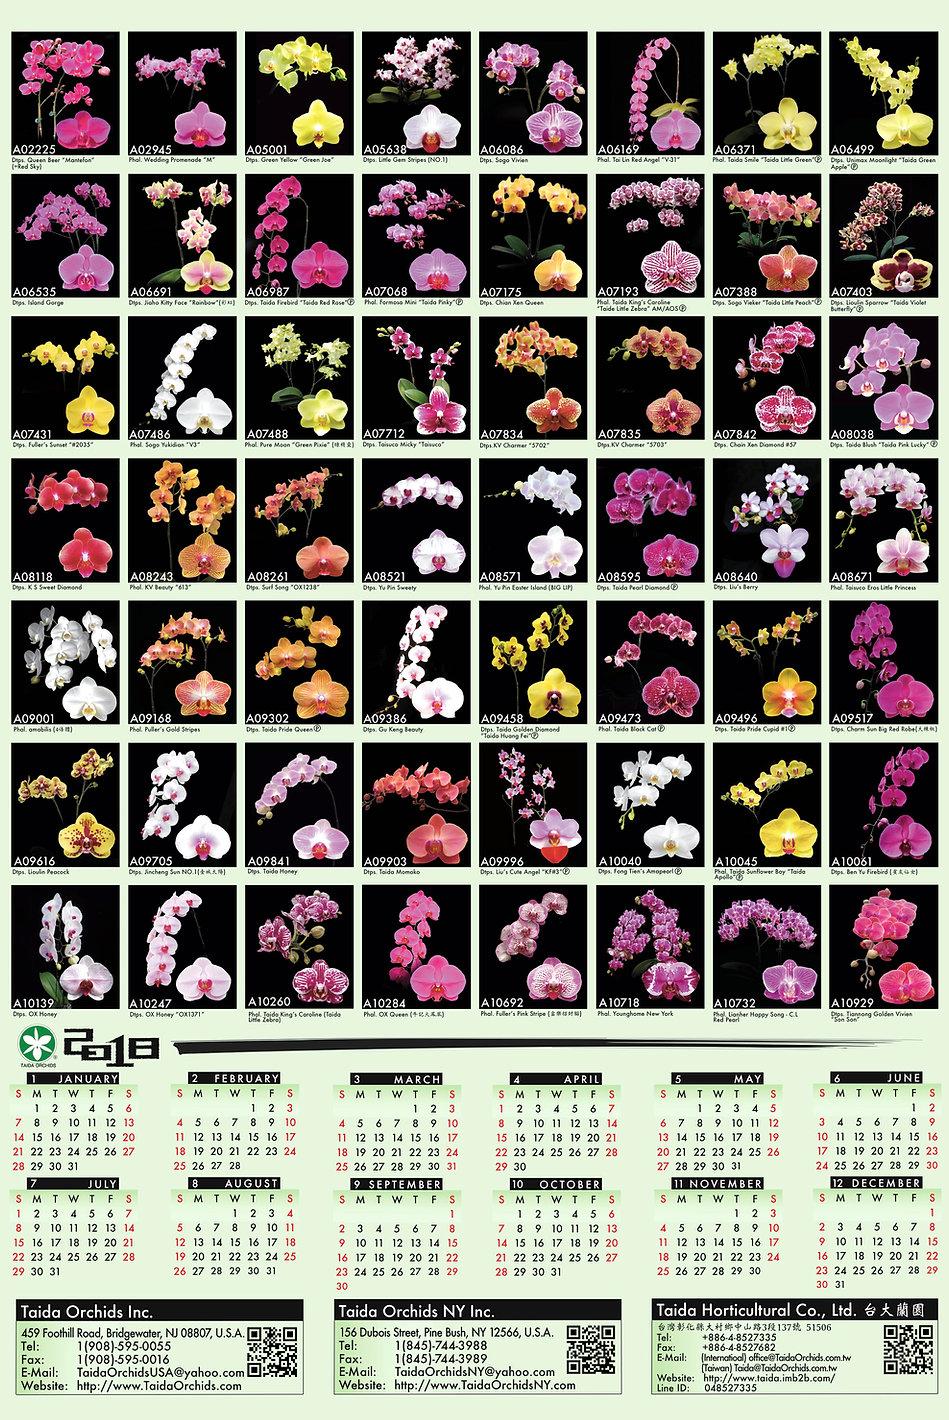 Taida Orchids 2018 Catalog